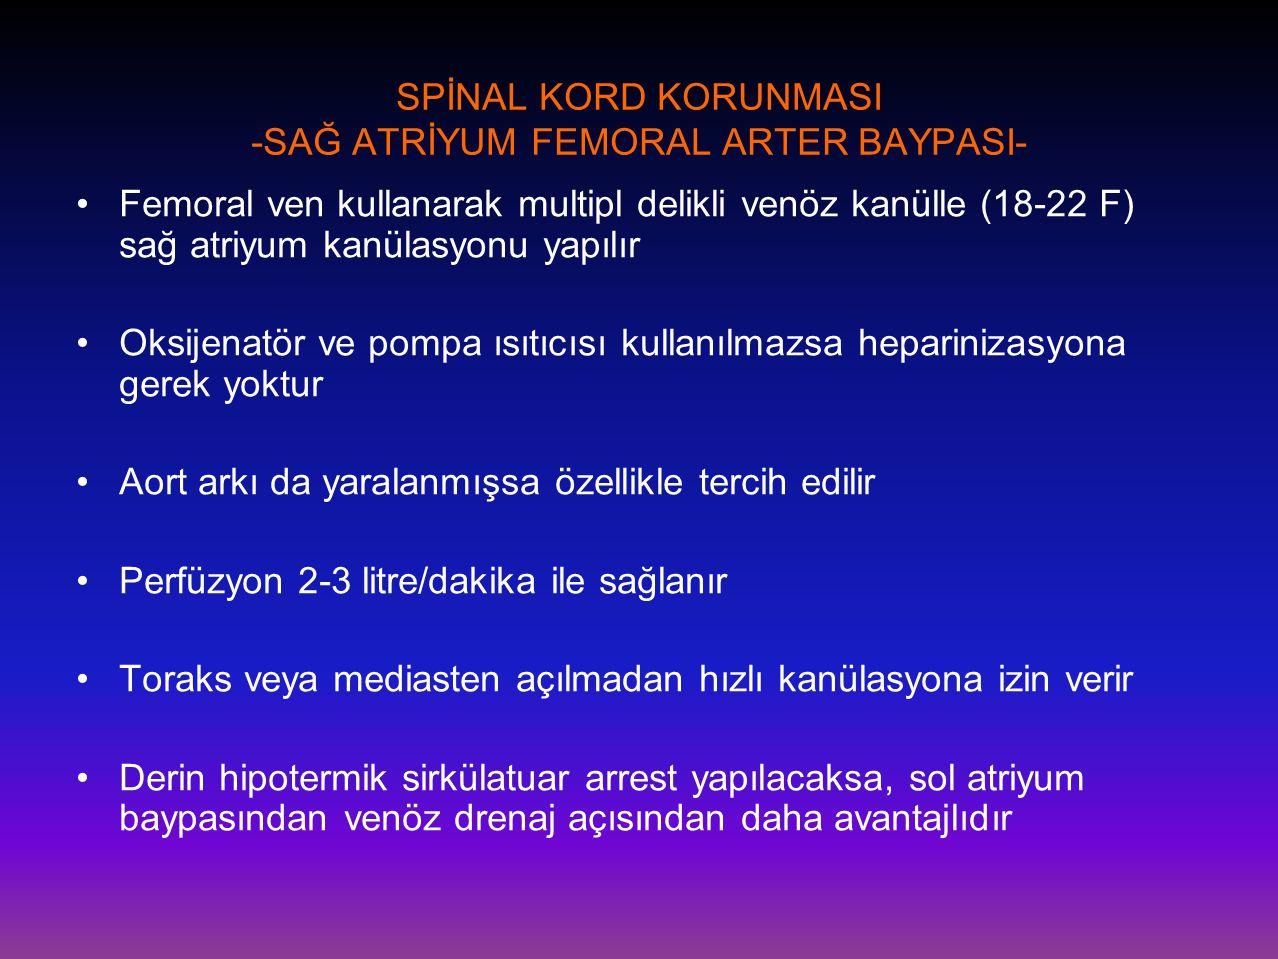 SPİNAL KORD KORUNMASI -SAĞ ATRİYUM FEMORAL ARTER BAYPASI-